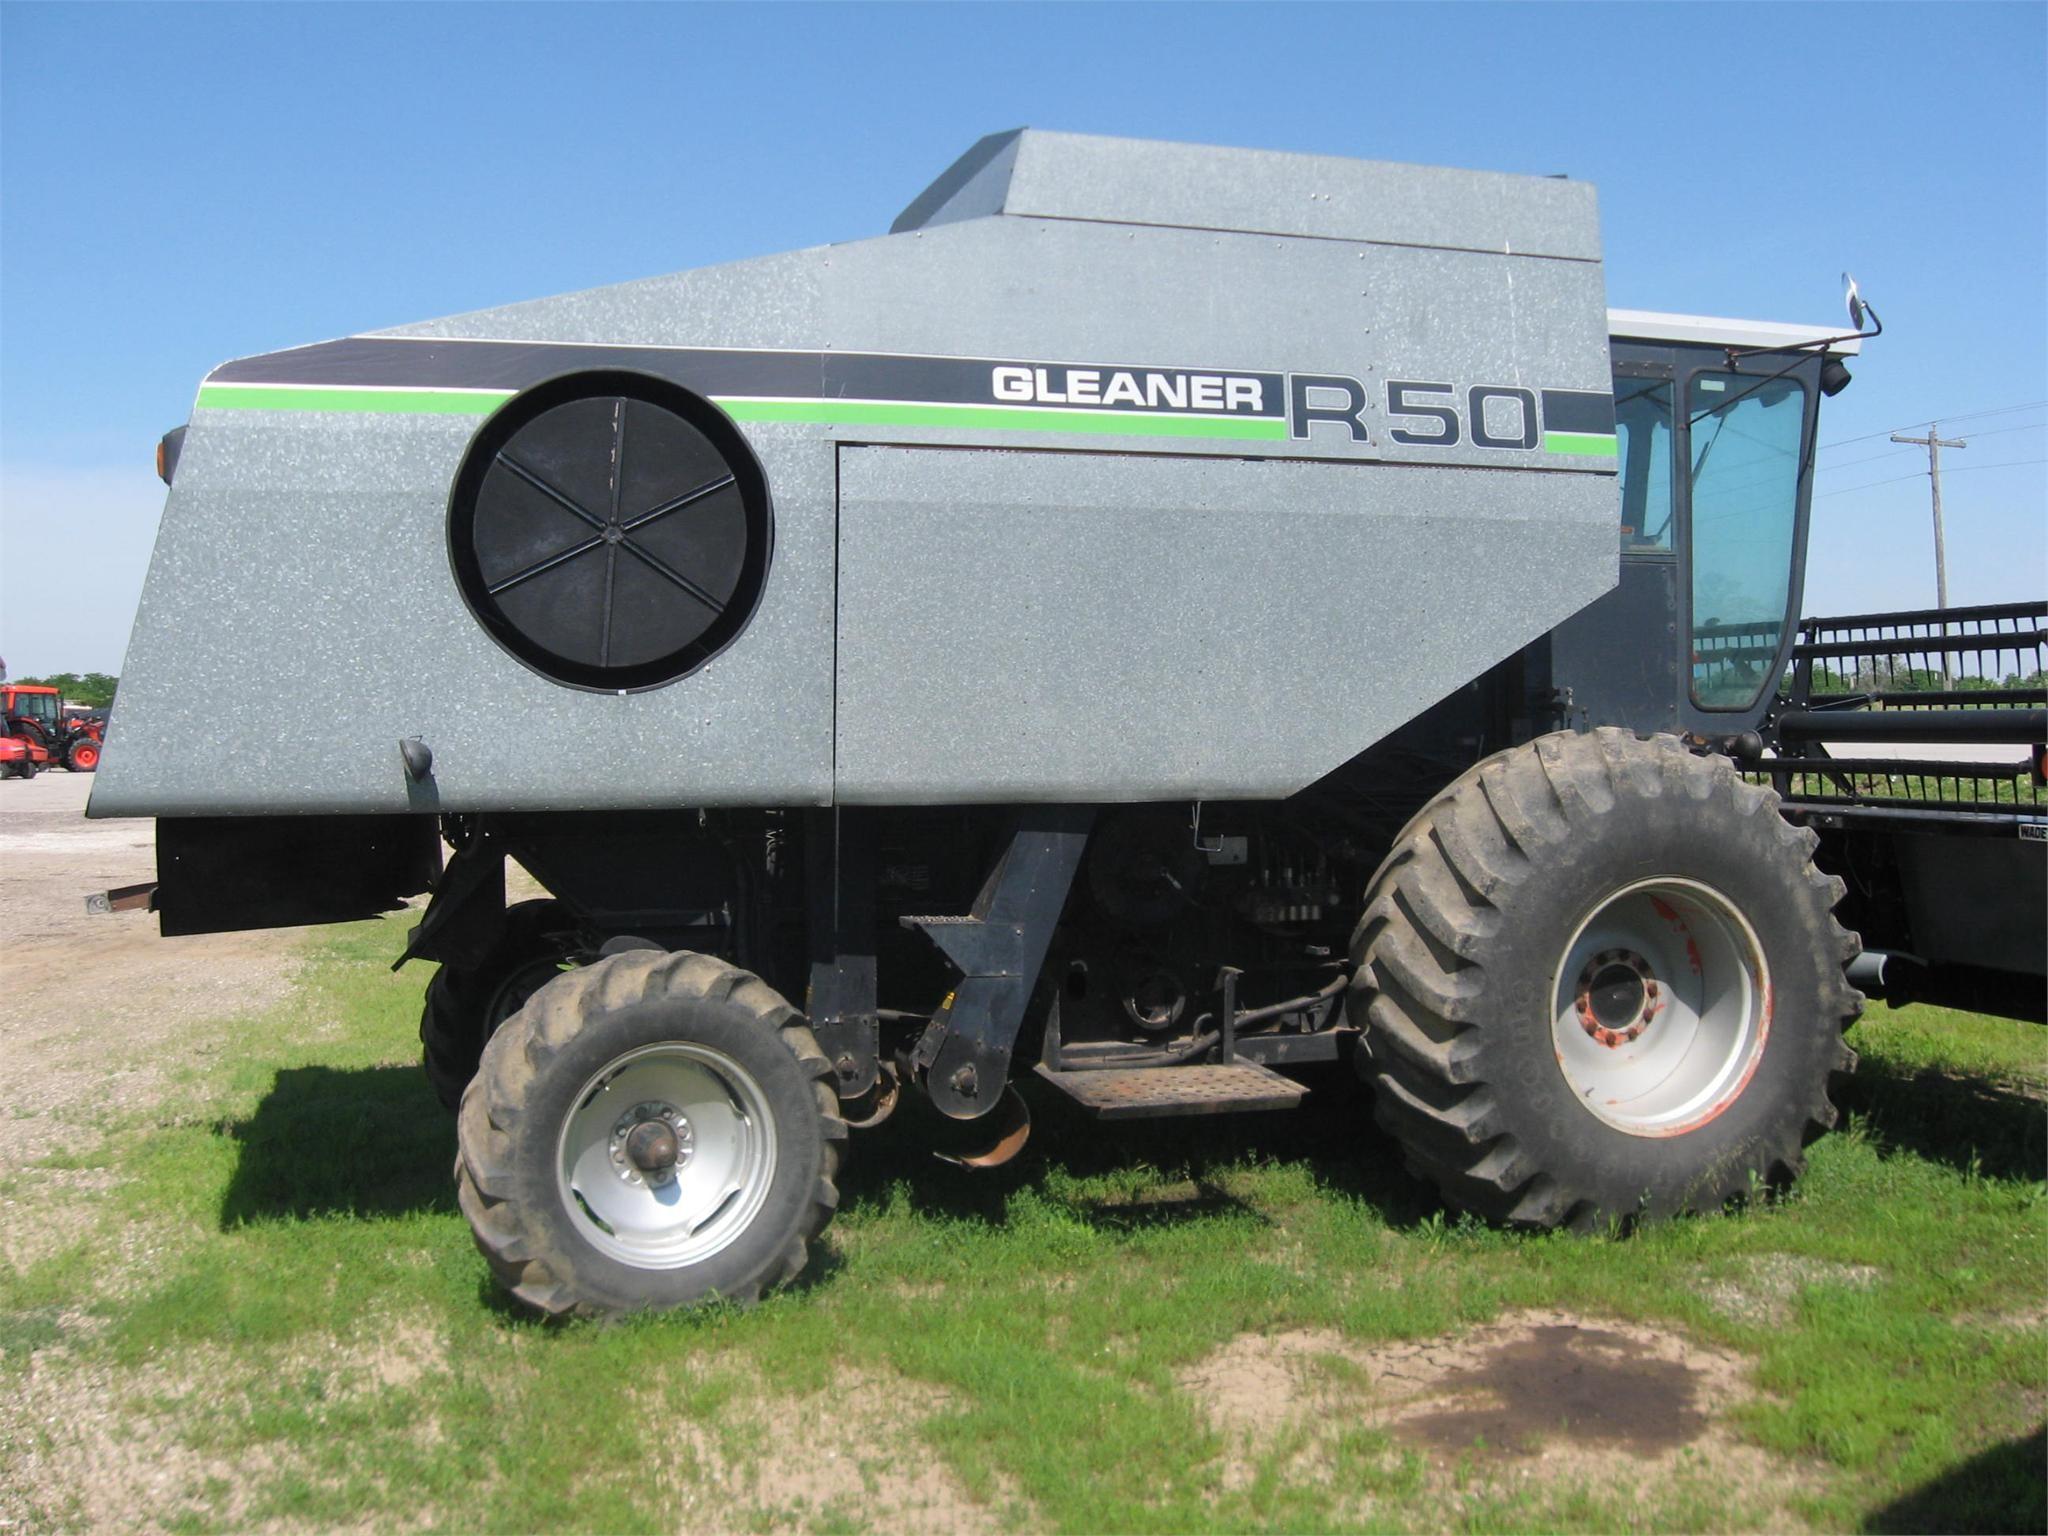 1989 Gleaner R50 Combine